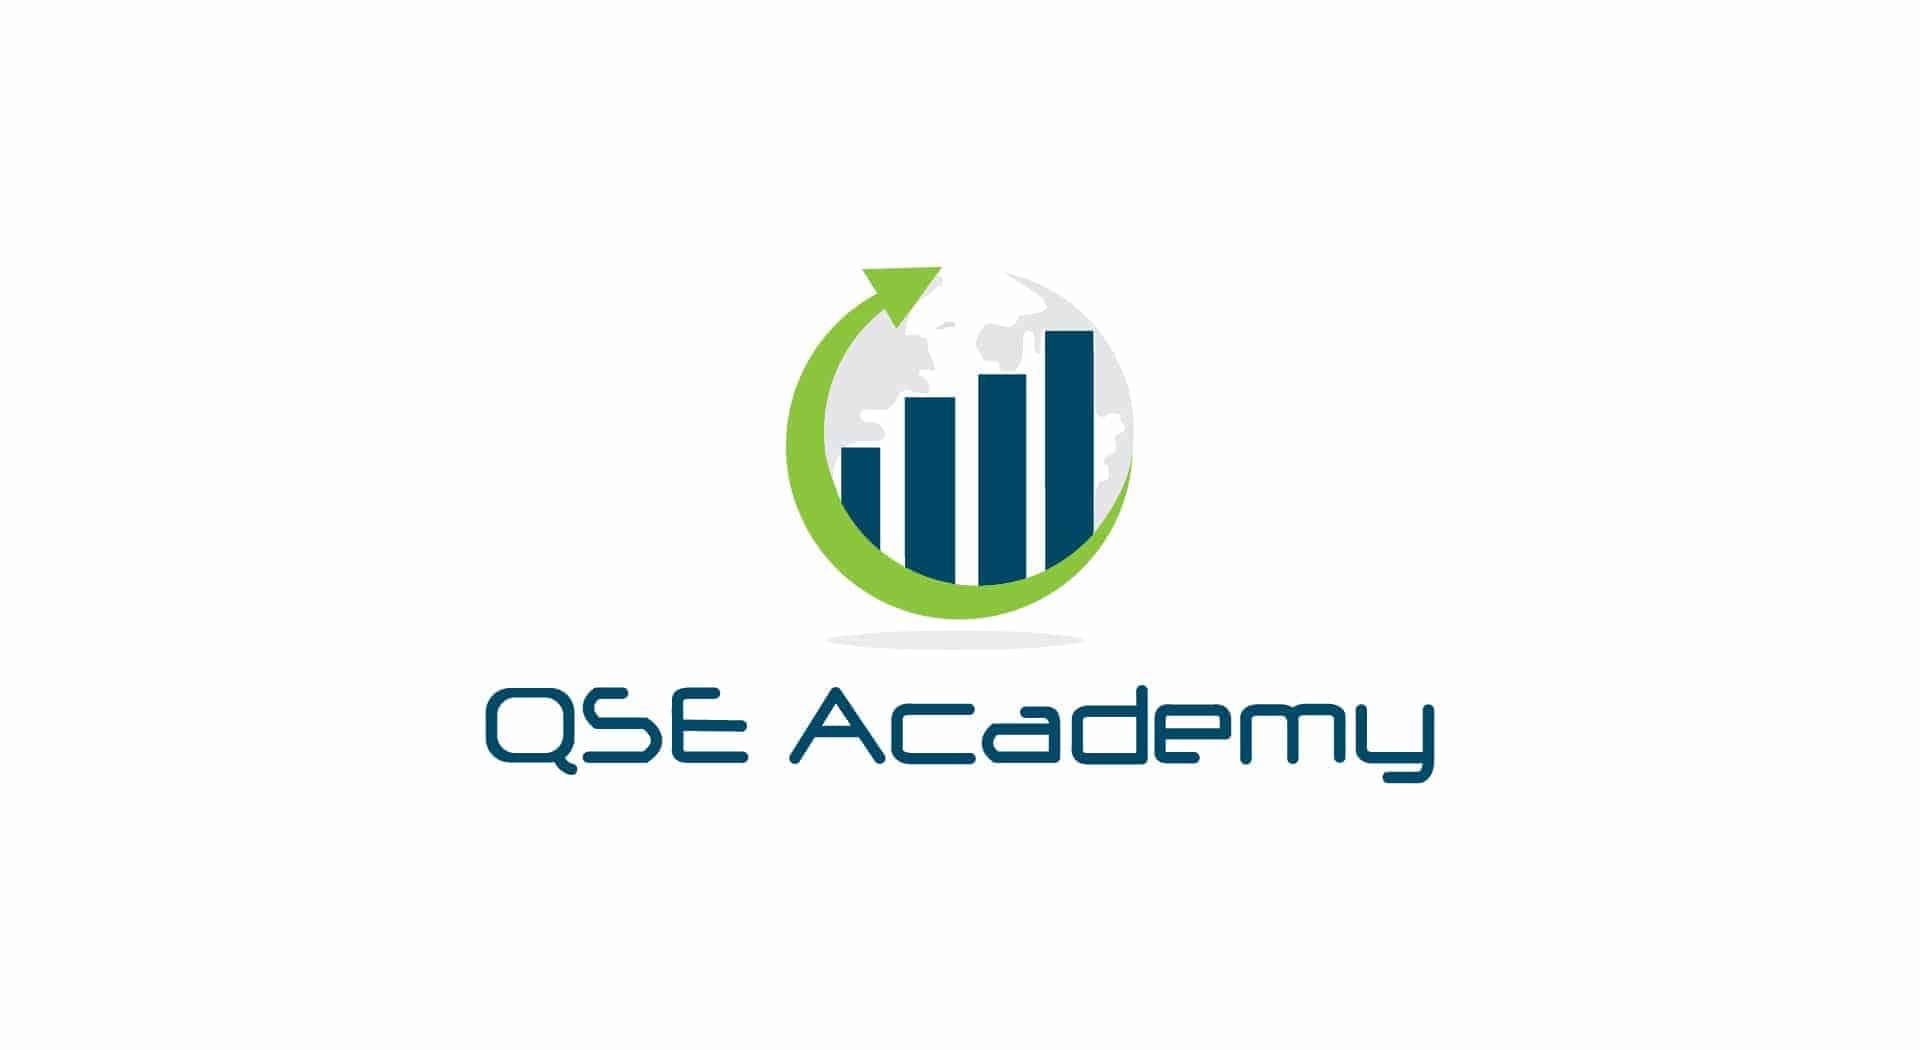 Qse academy